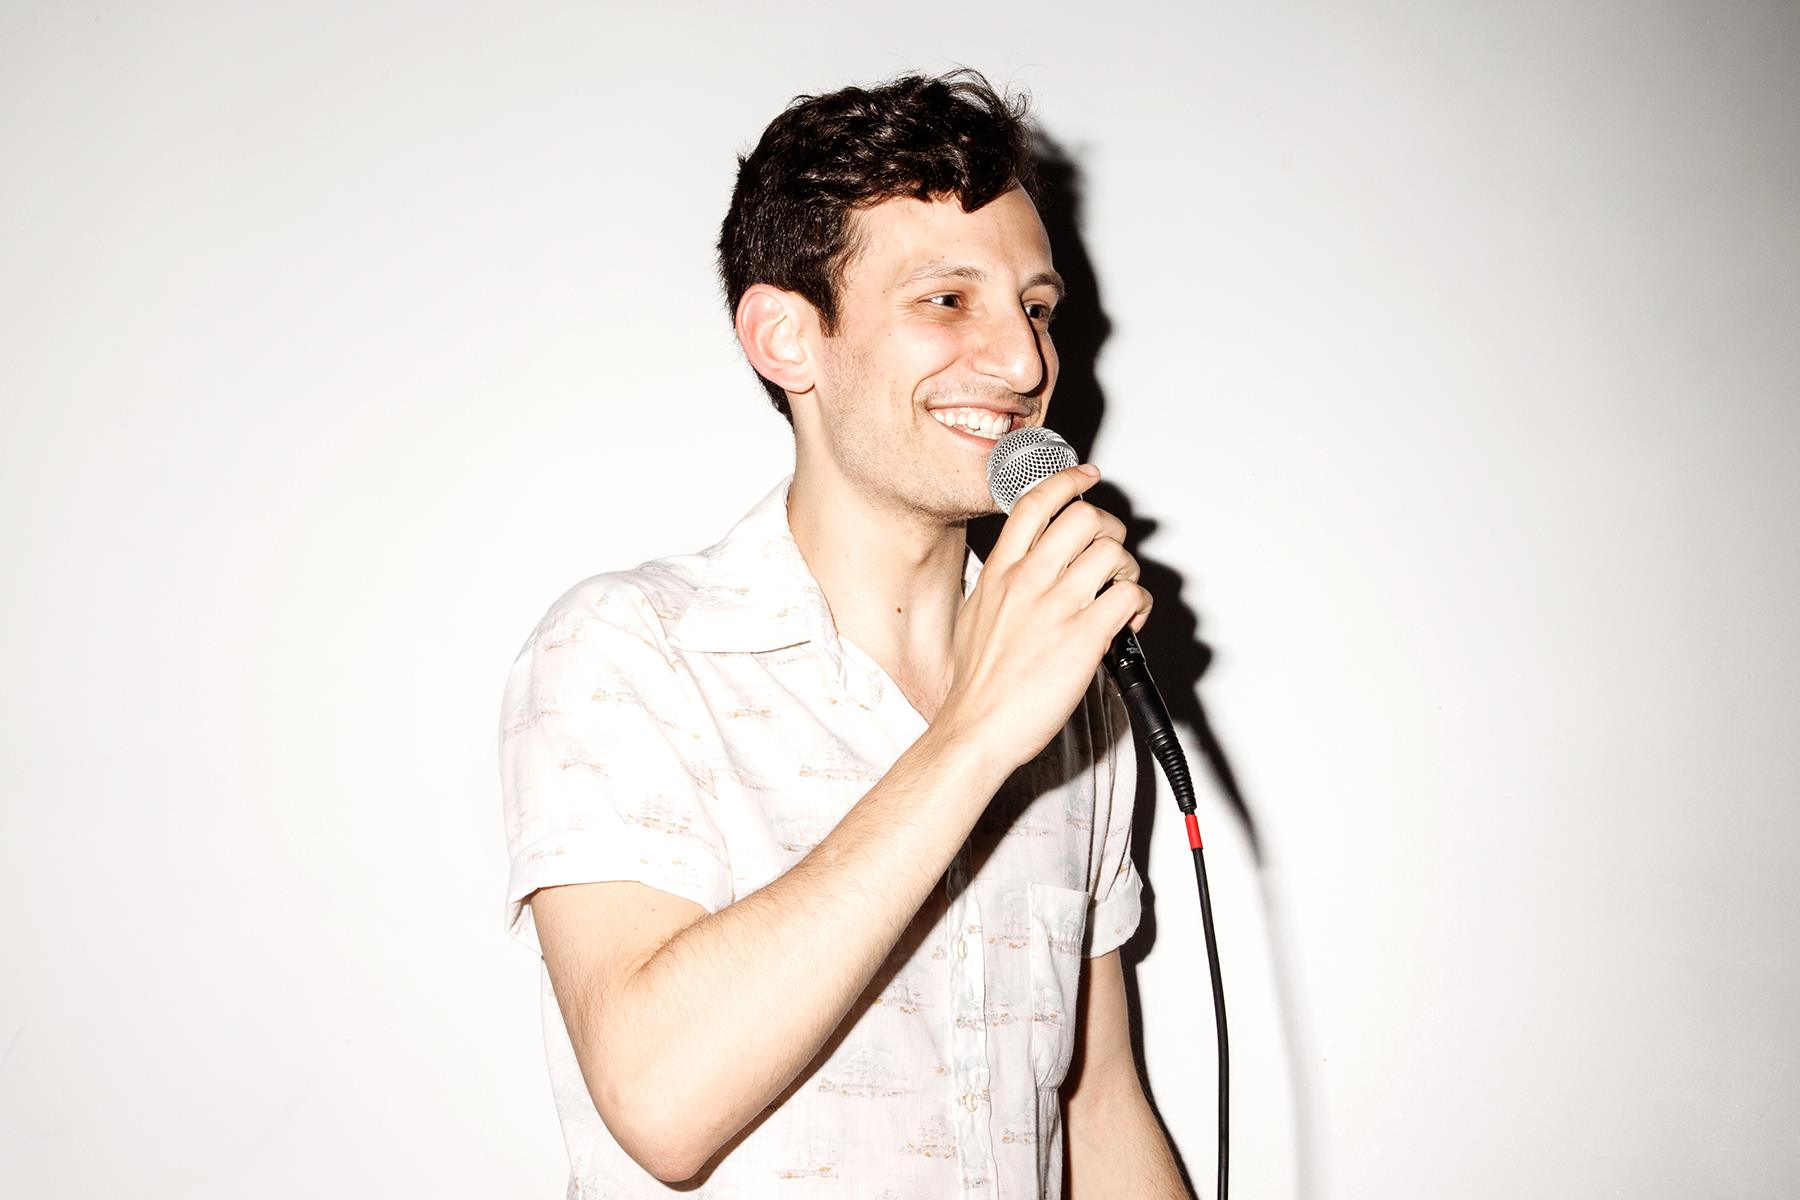 Dan holding mic.jpg